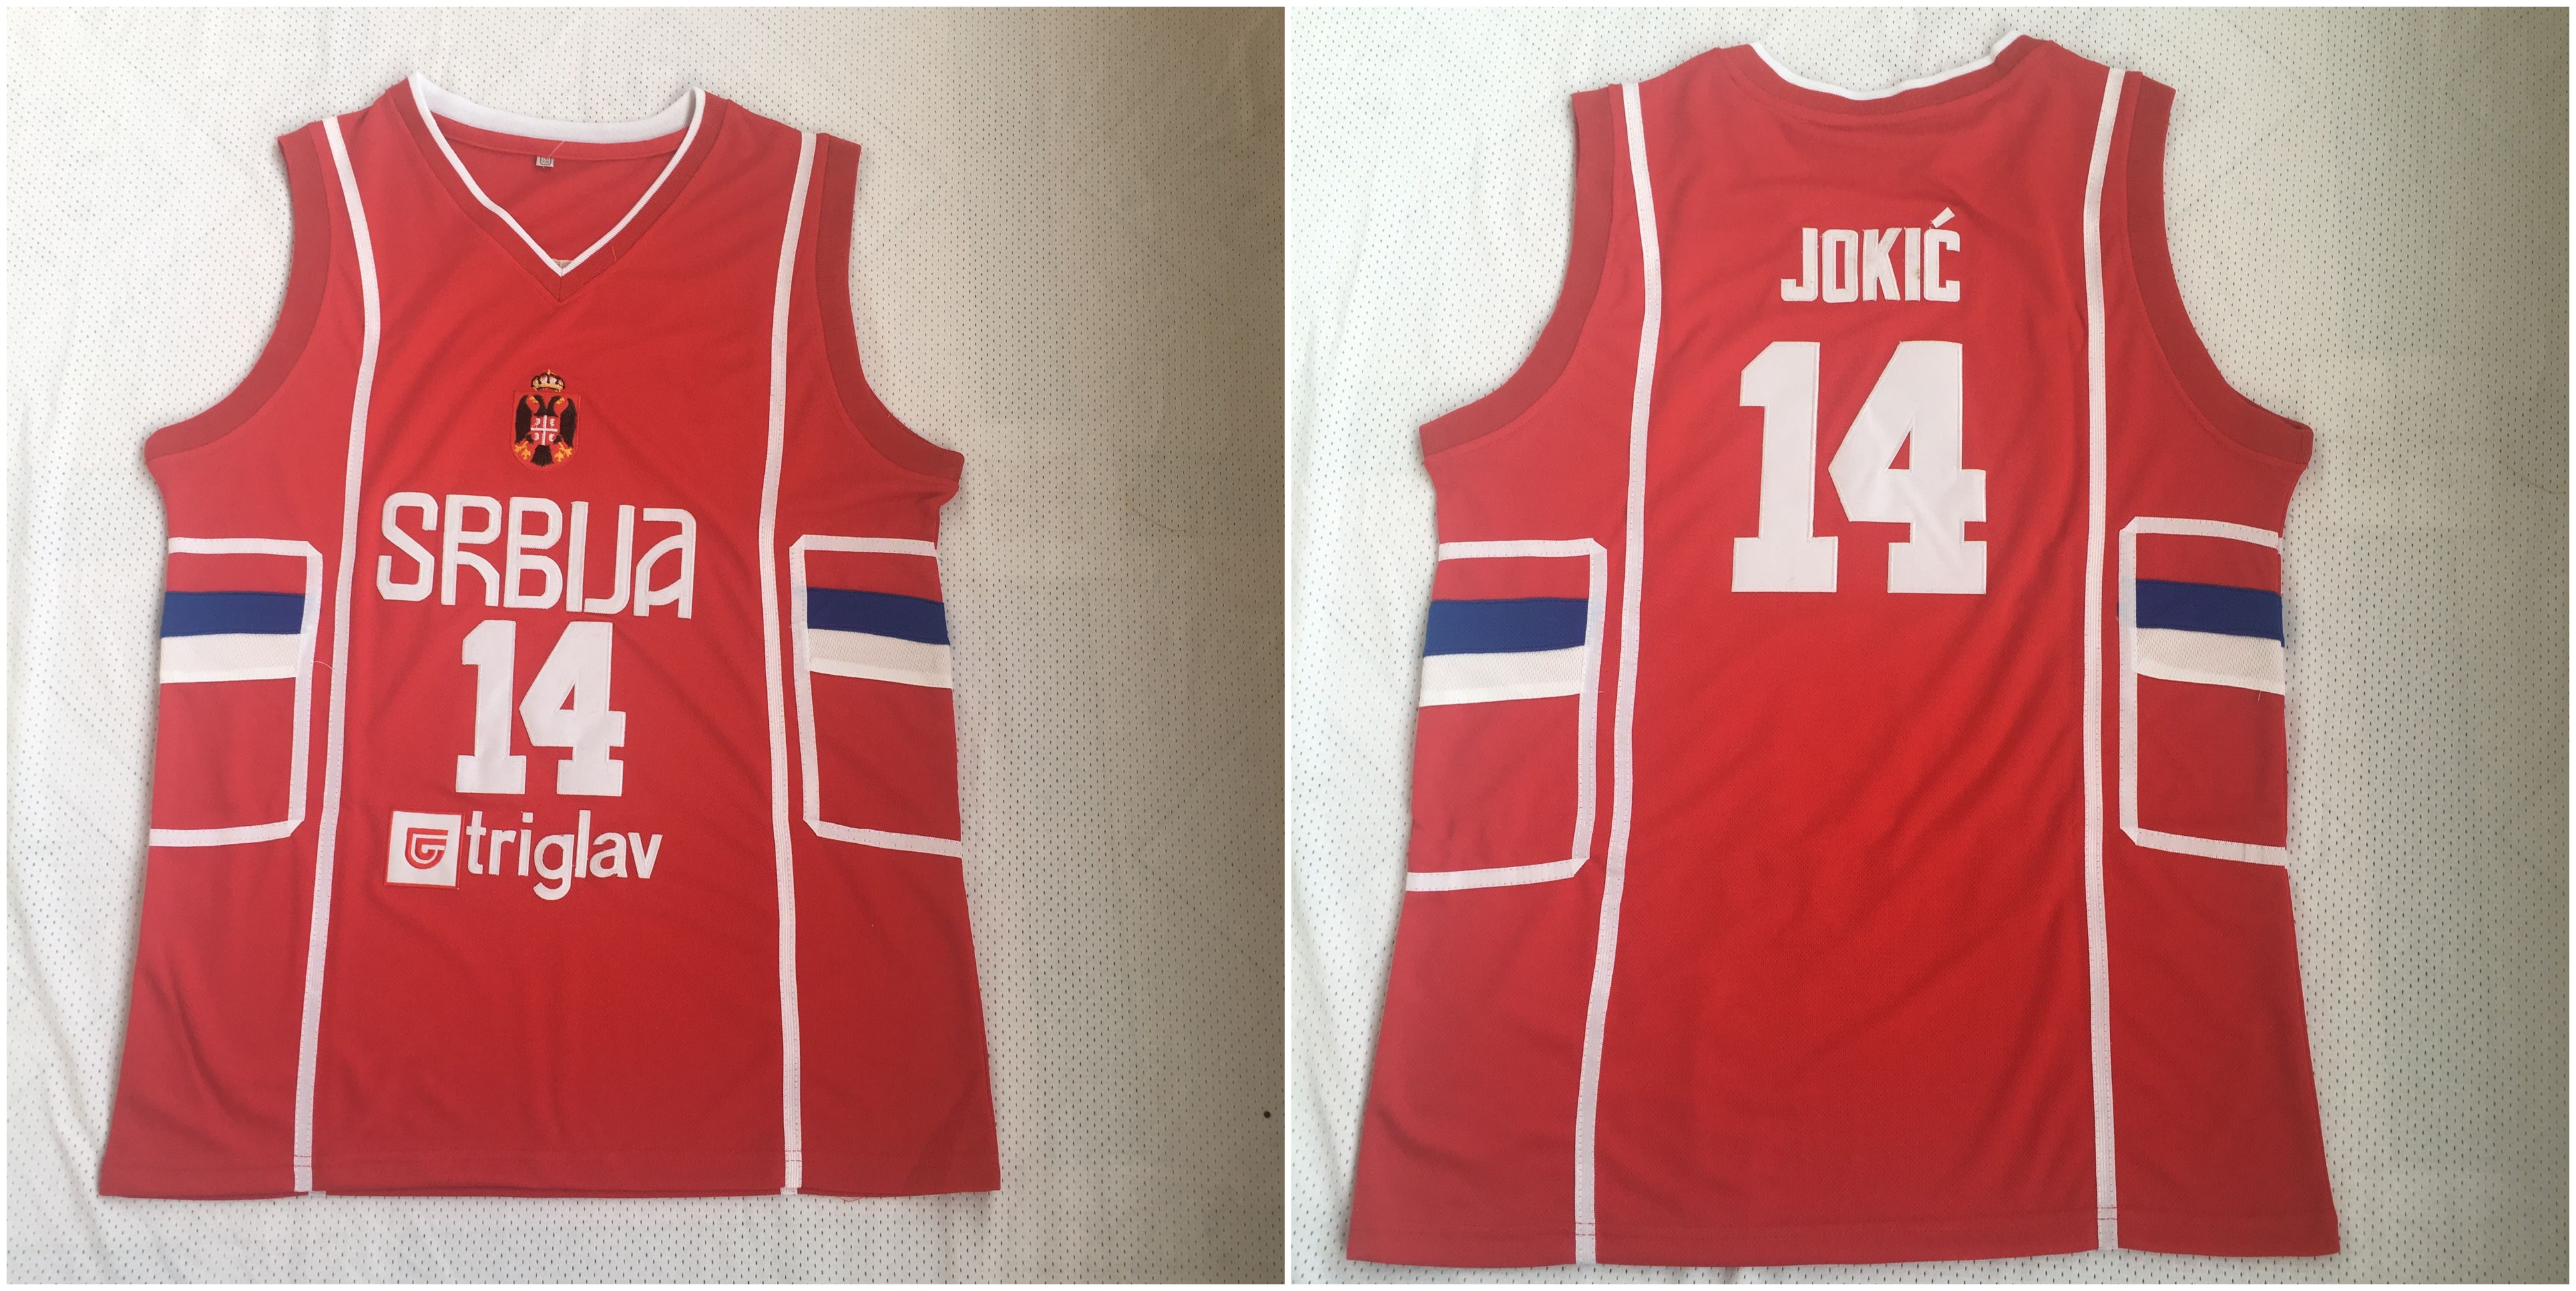 Serbia 14 Nikola Jokic Red Retro Classic Stitched Basketball Jersey